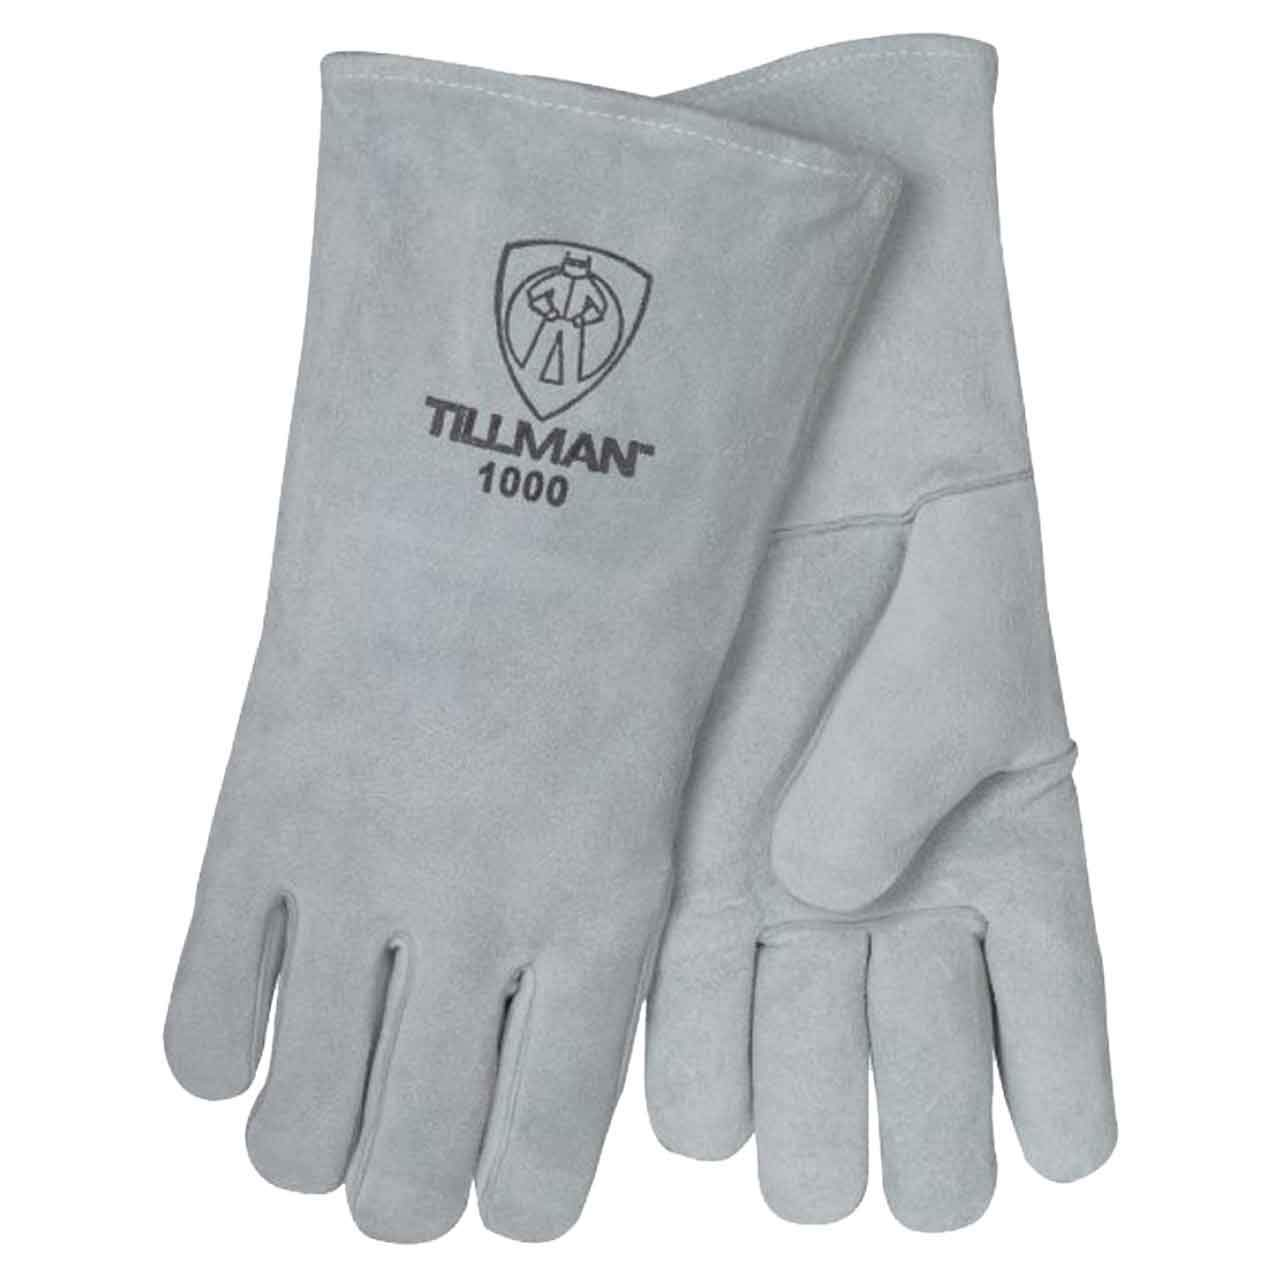 Steiner 2119C-XS Kevlar Side Split Cowhide Leather Welding Gloves Extra Small